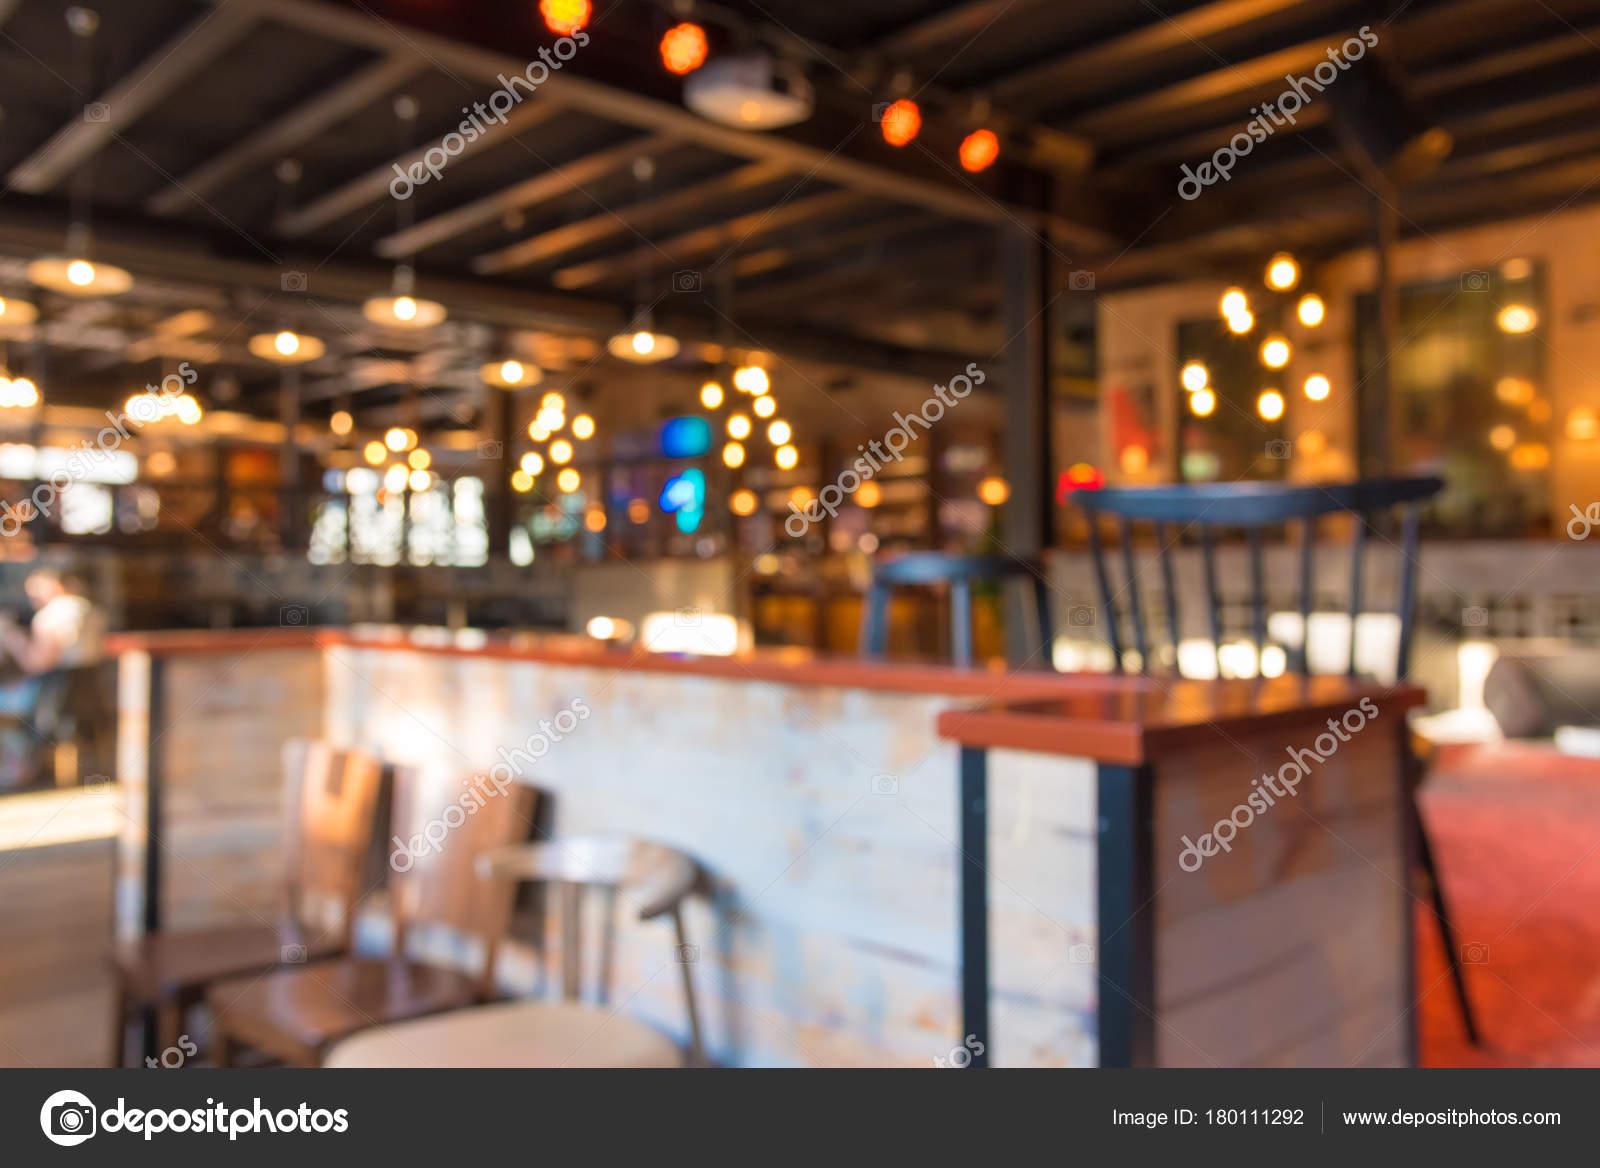 https://st3.depositphotos.com/1896403/18011/i/1600/depositphotos_180111292-stock-photo-abstract-blur-background-of-restaurant.jpg